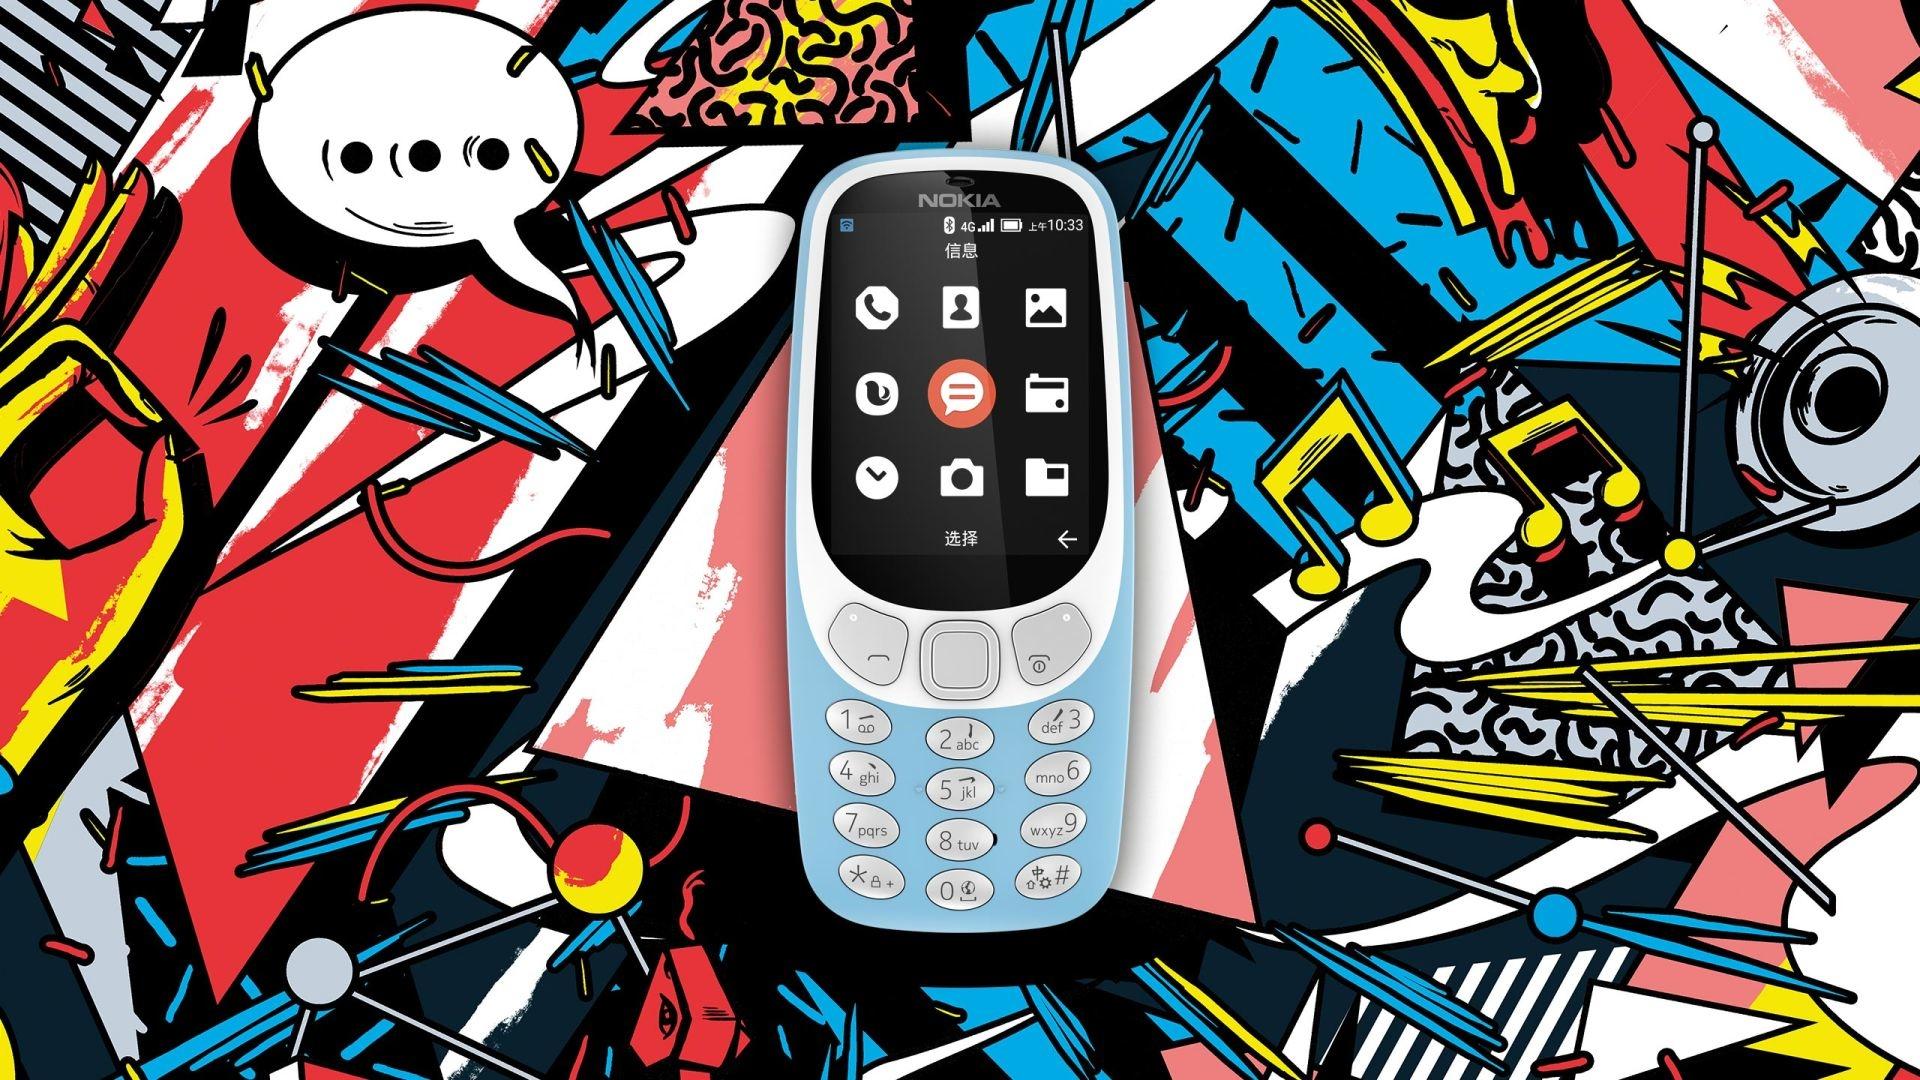 Vyhodyť 4G-versija najvidomišogo telefona Nokia